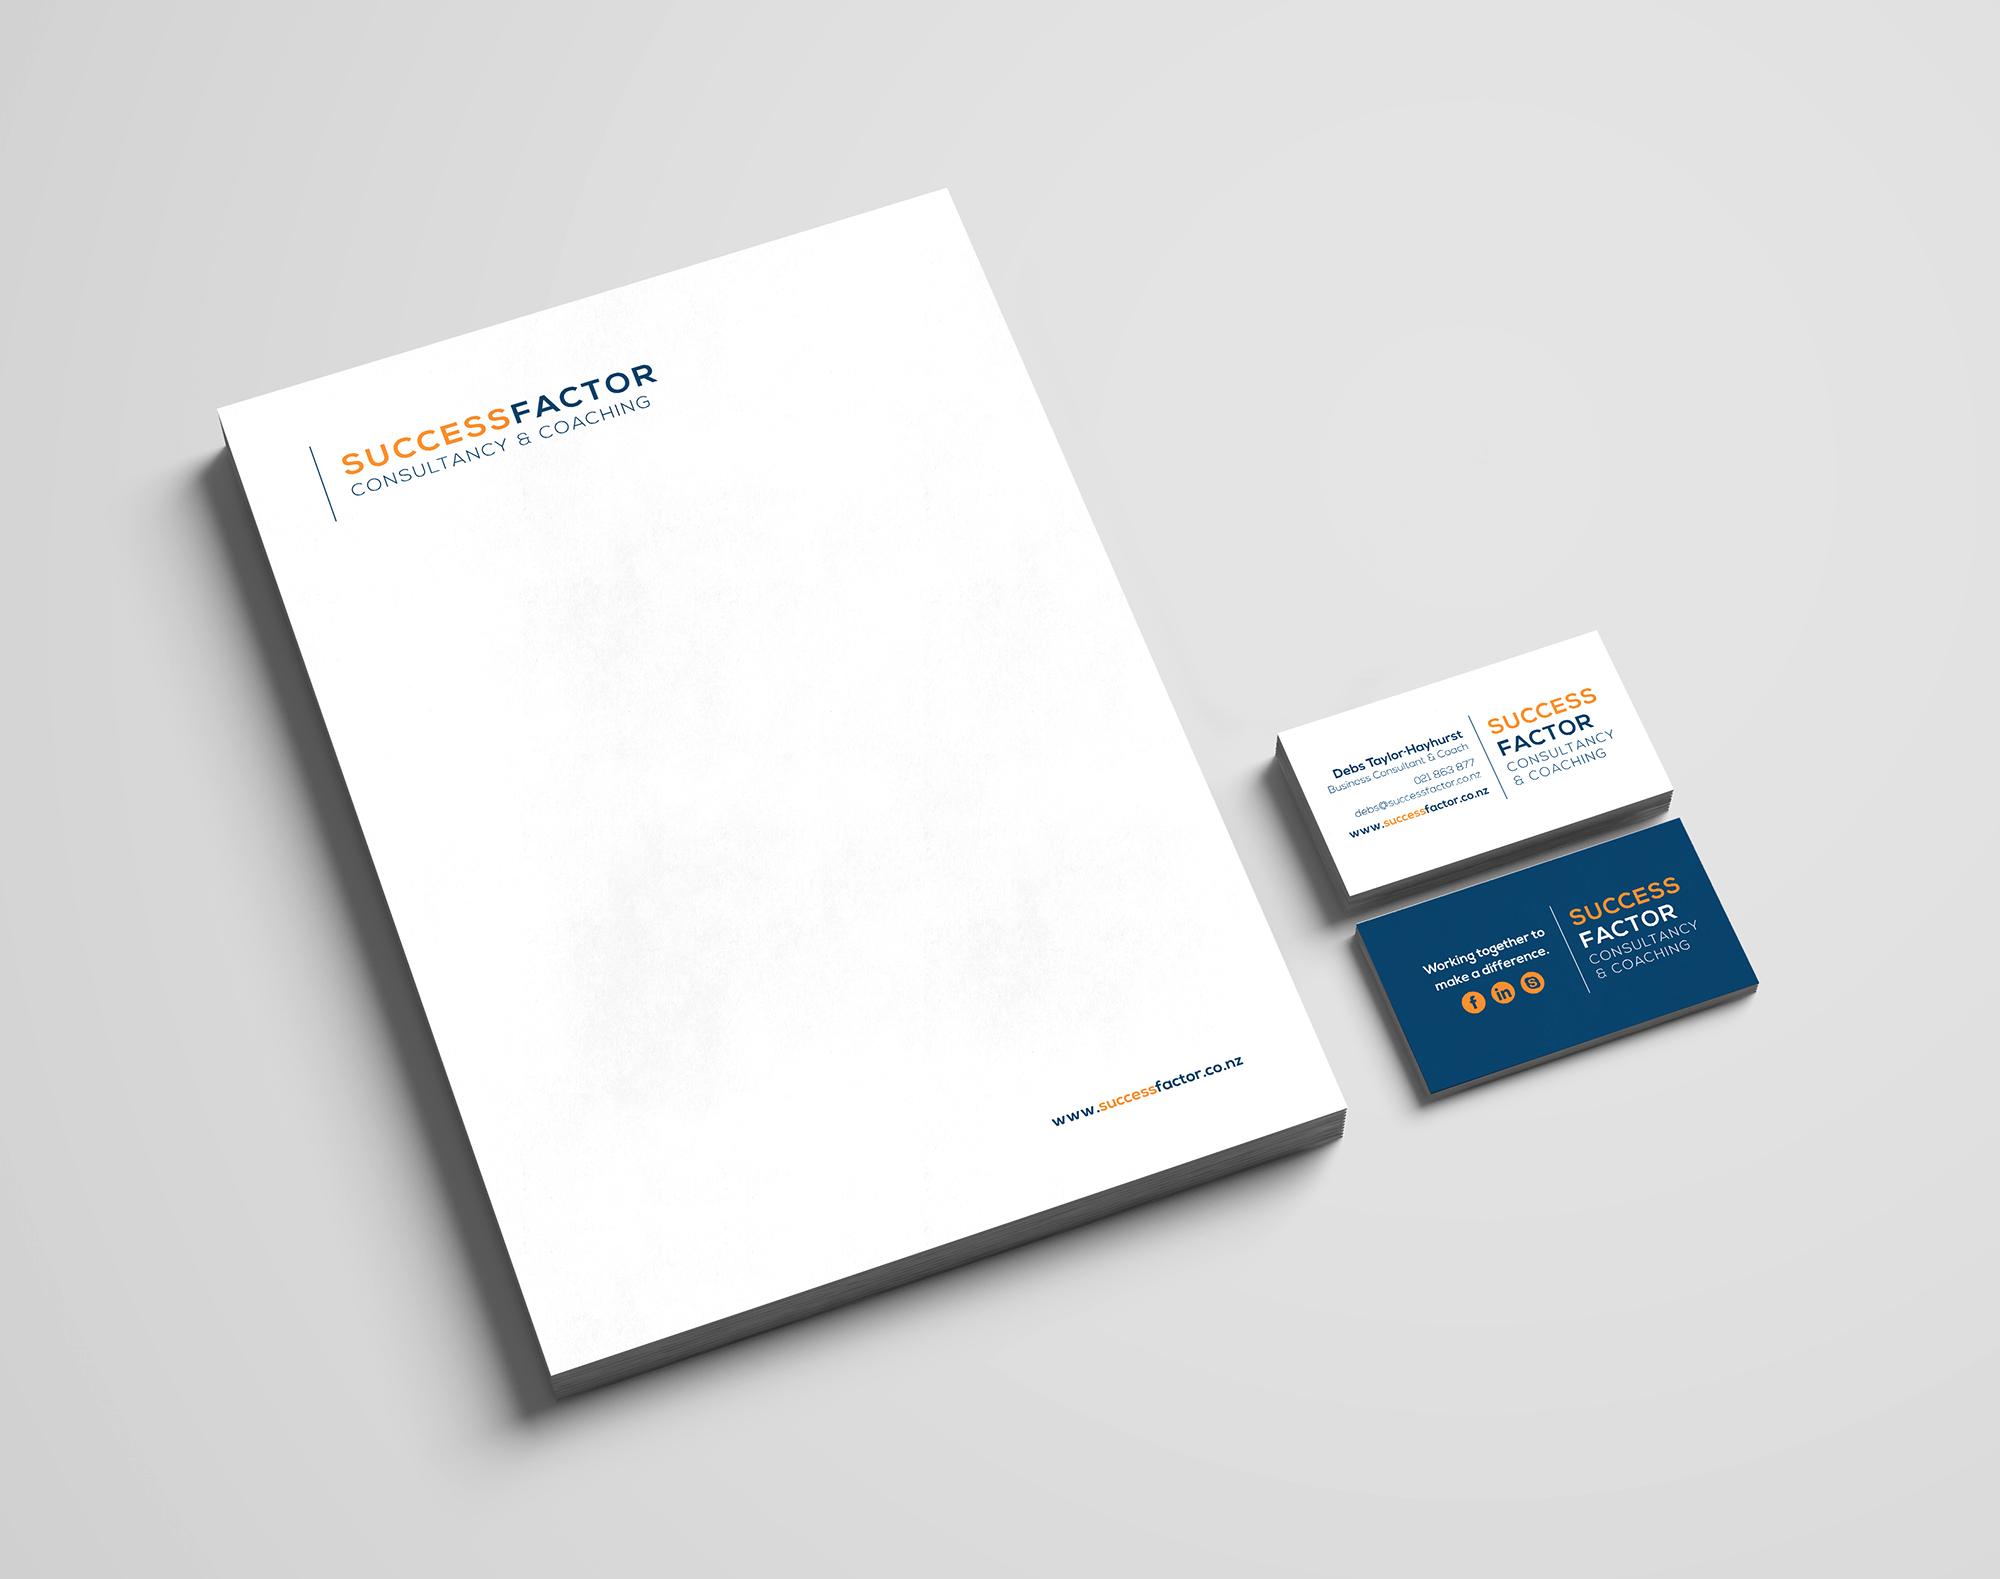 Success Factor Stationery Design.